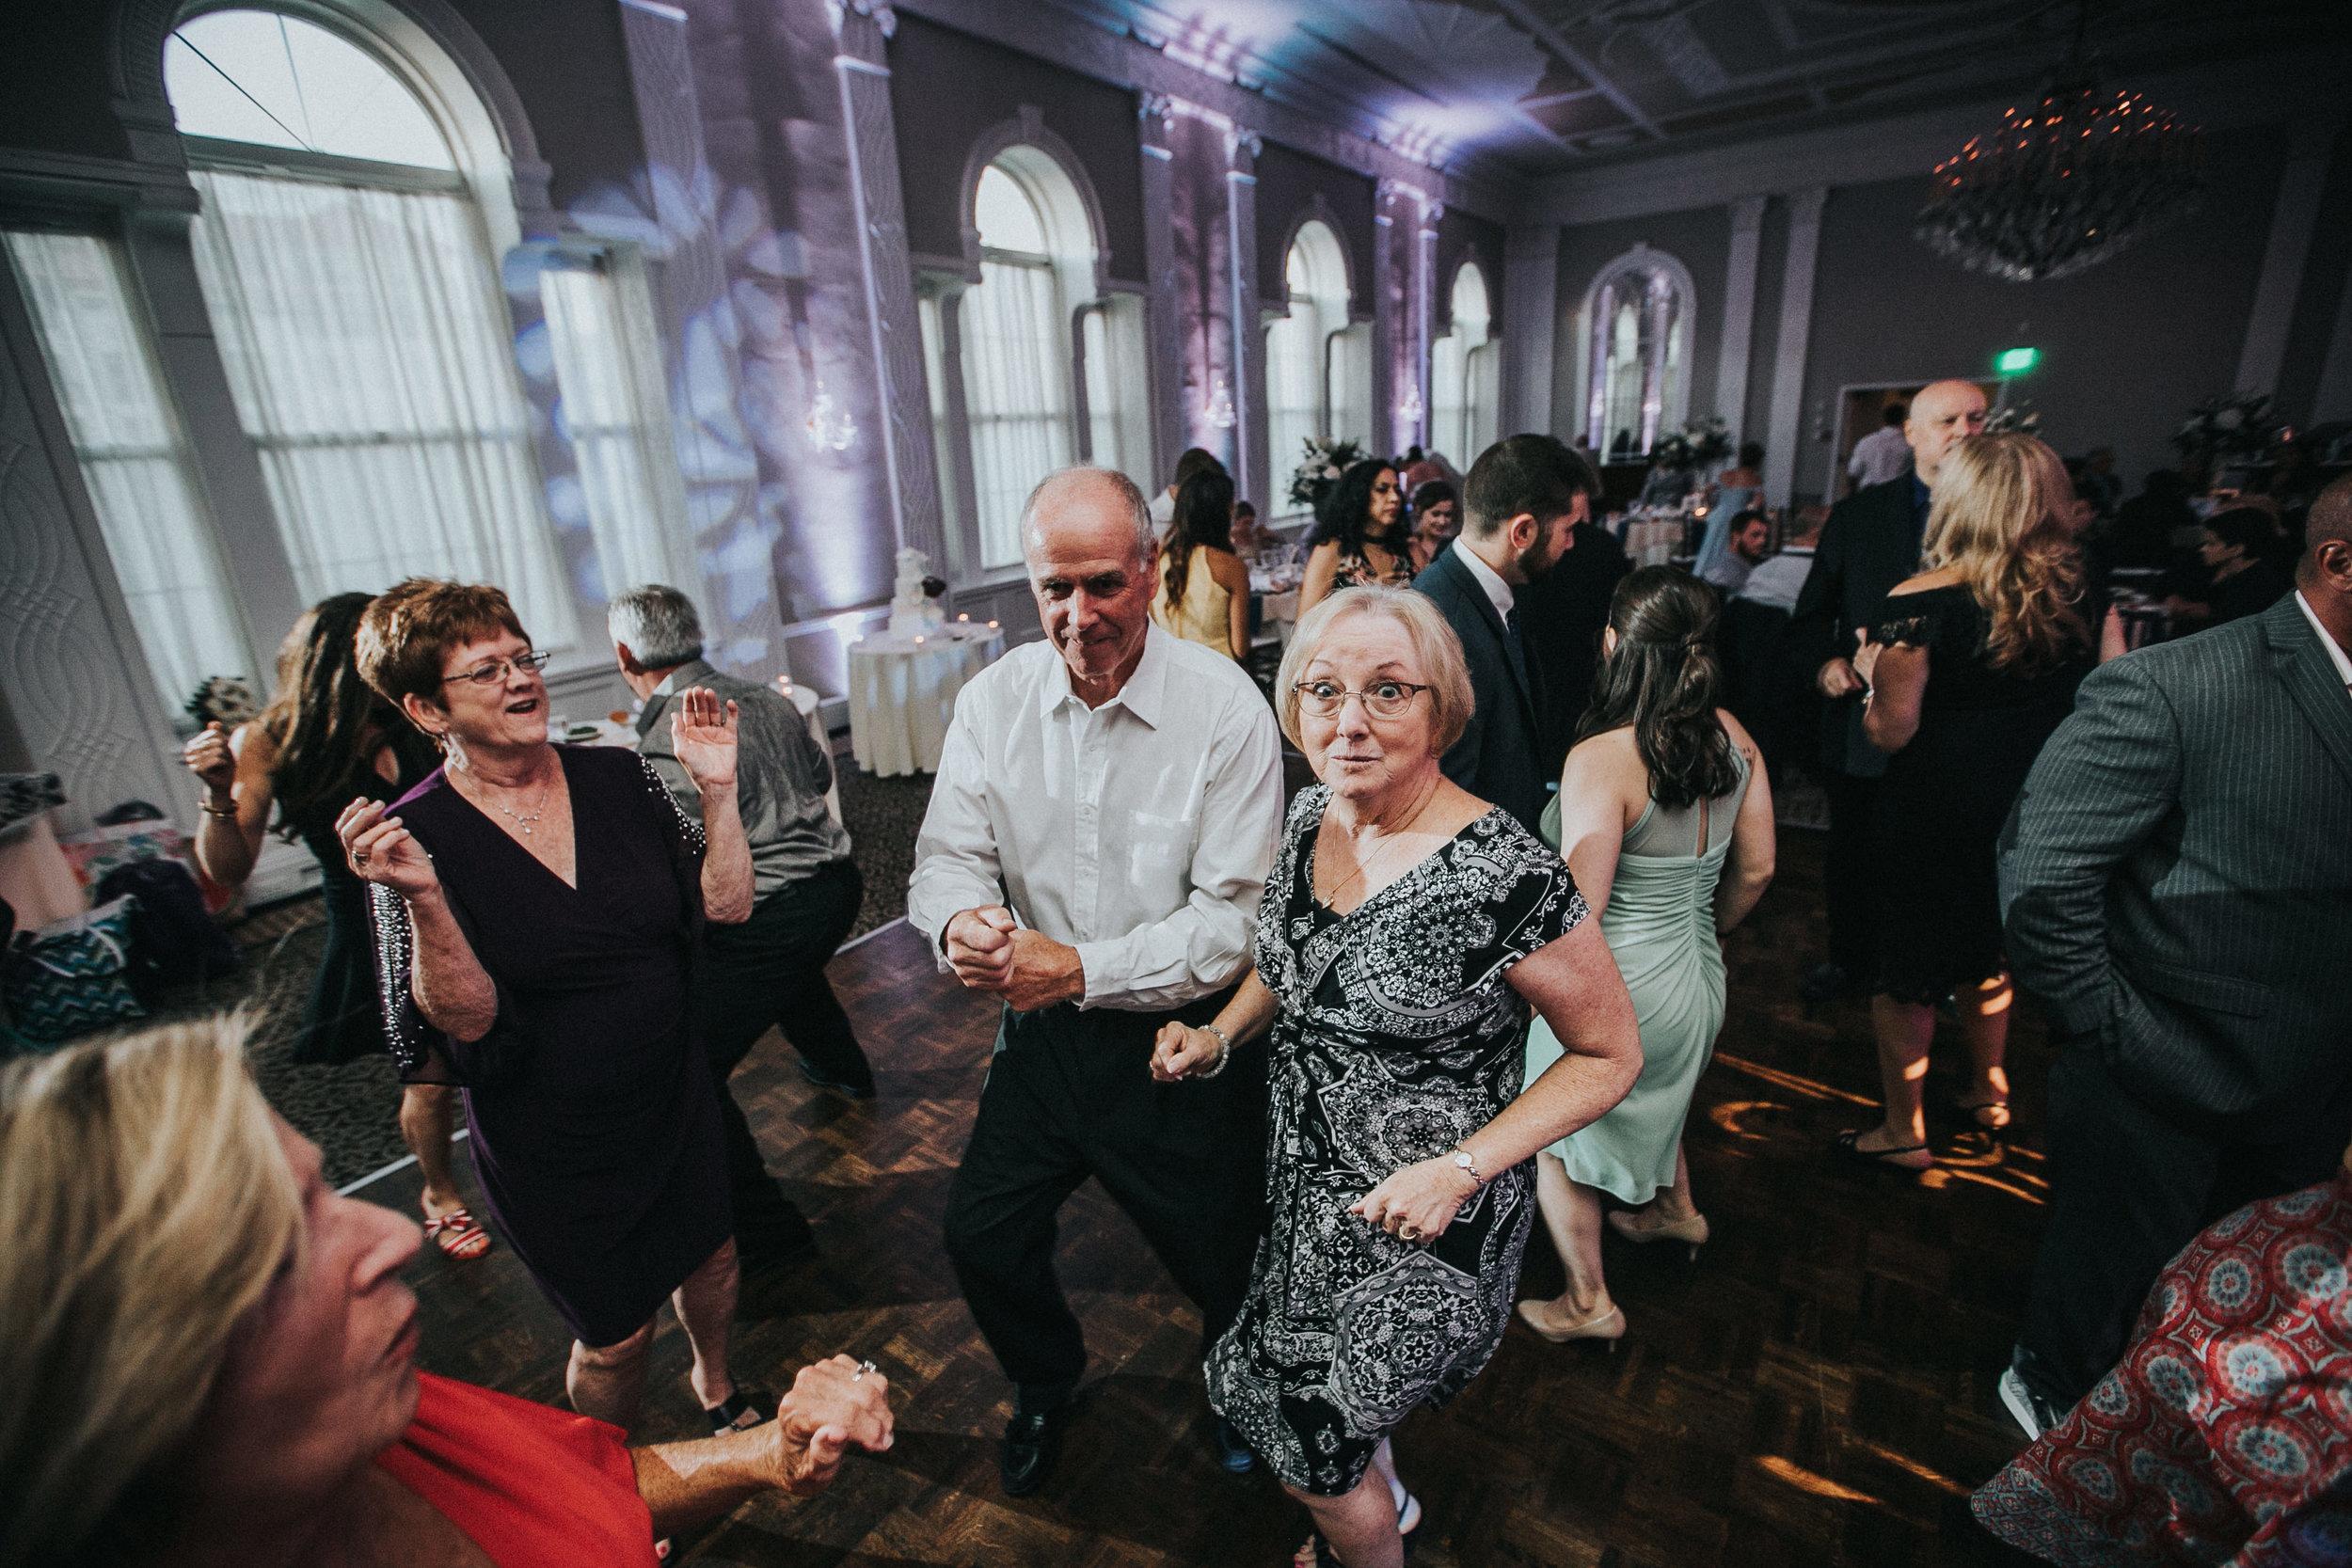 JennaLynnPhotography-NJWeddingPhotographer-Wedding-TheBerkeley-AsburyPark-Allison&Michael-Reception-112.jpg